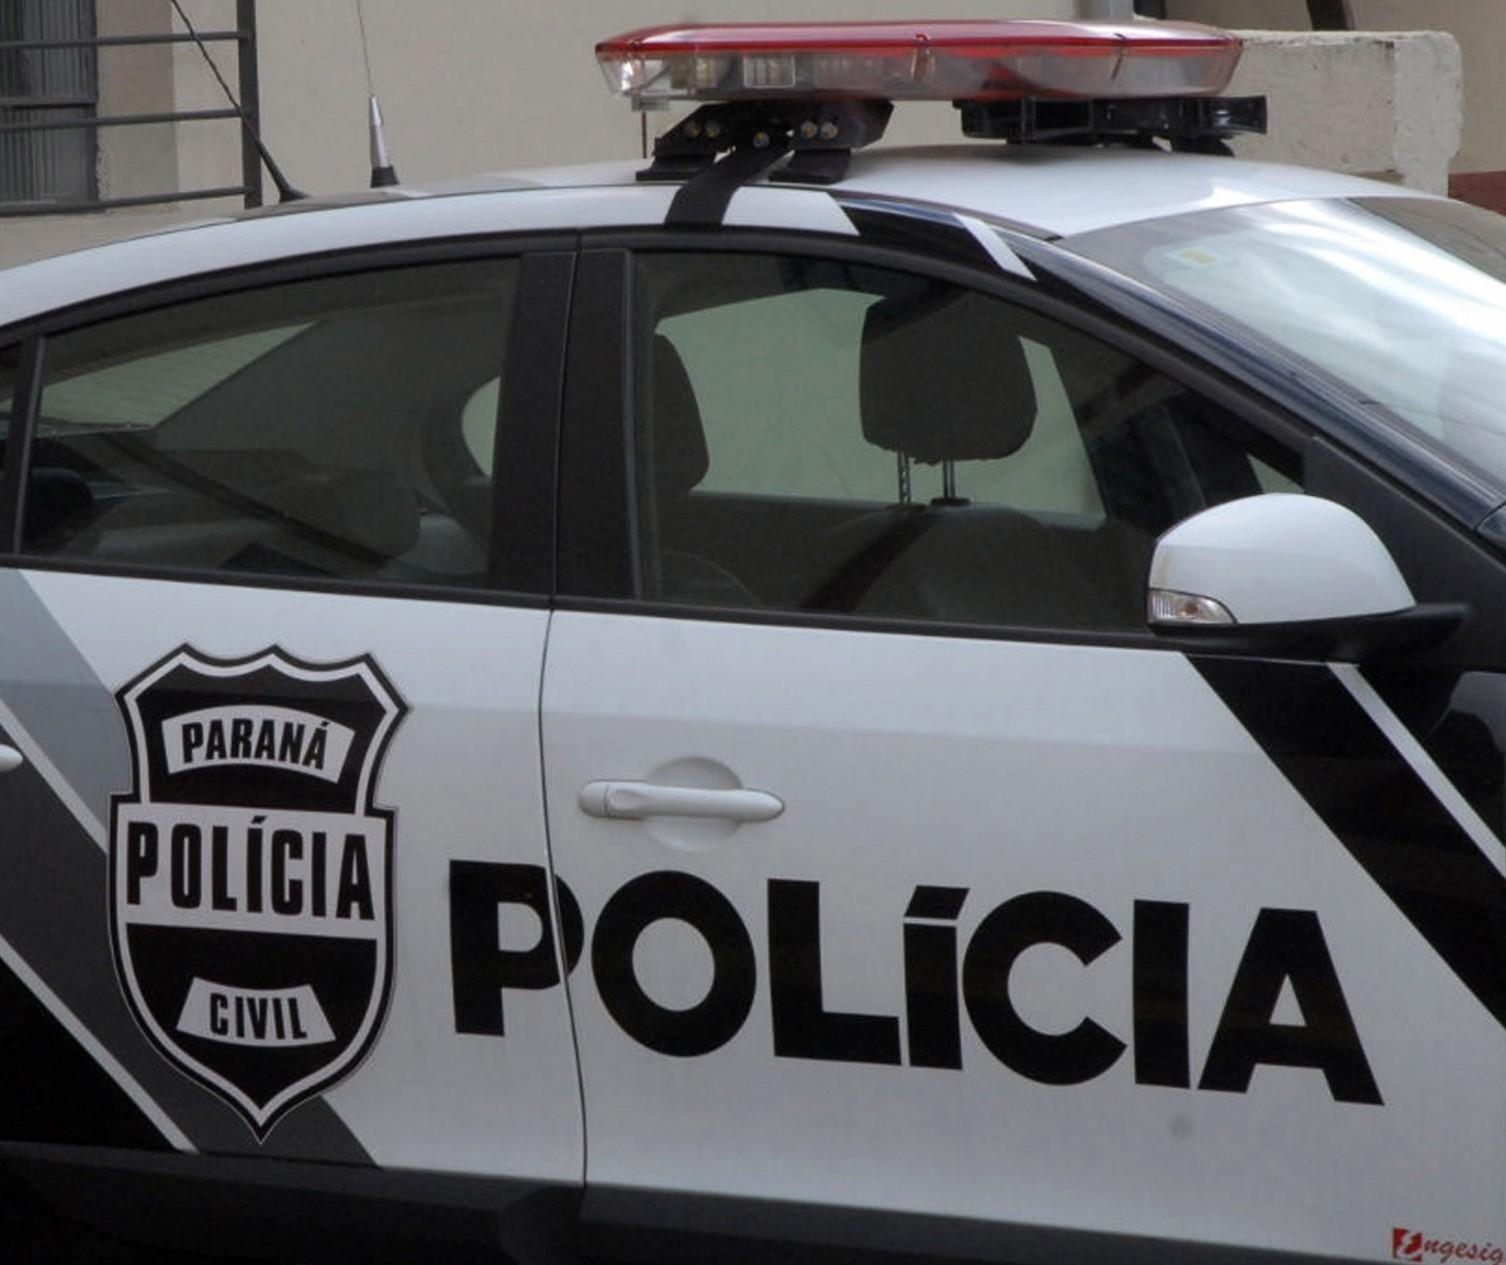 Polícia Civil aguarda laudo de segundo suspeito no caso Magó